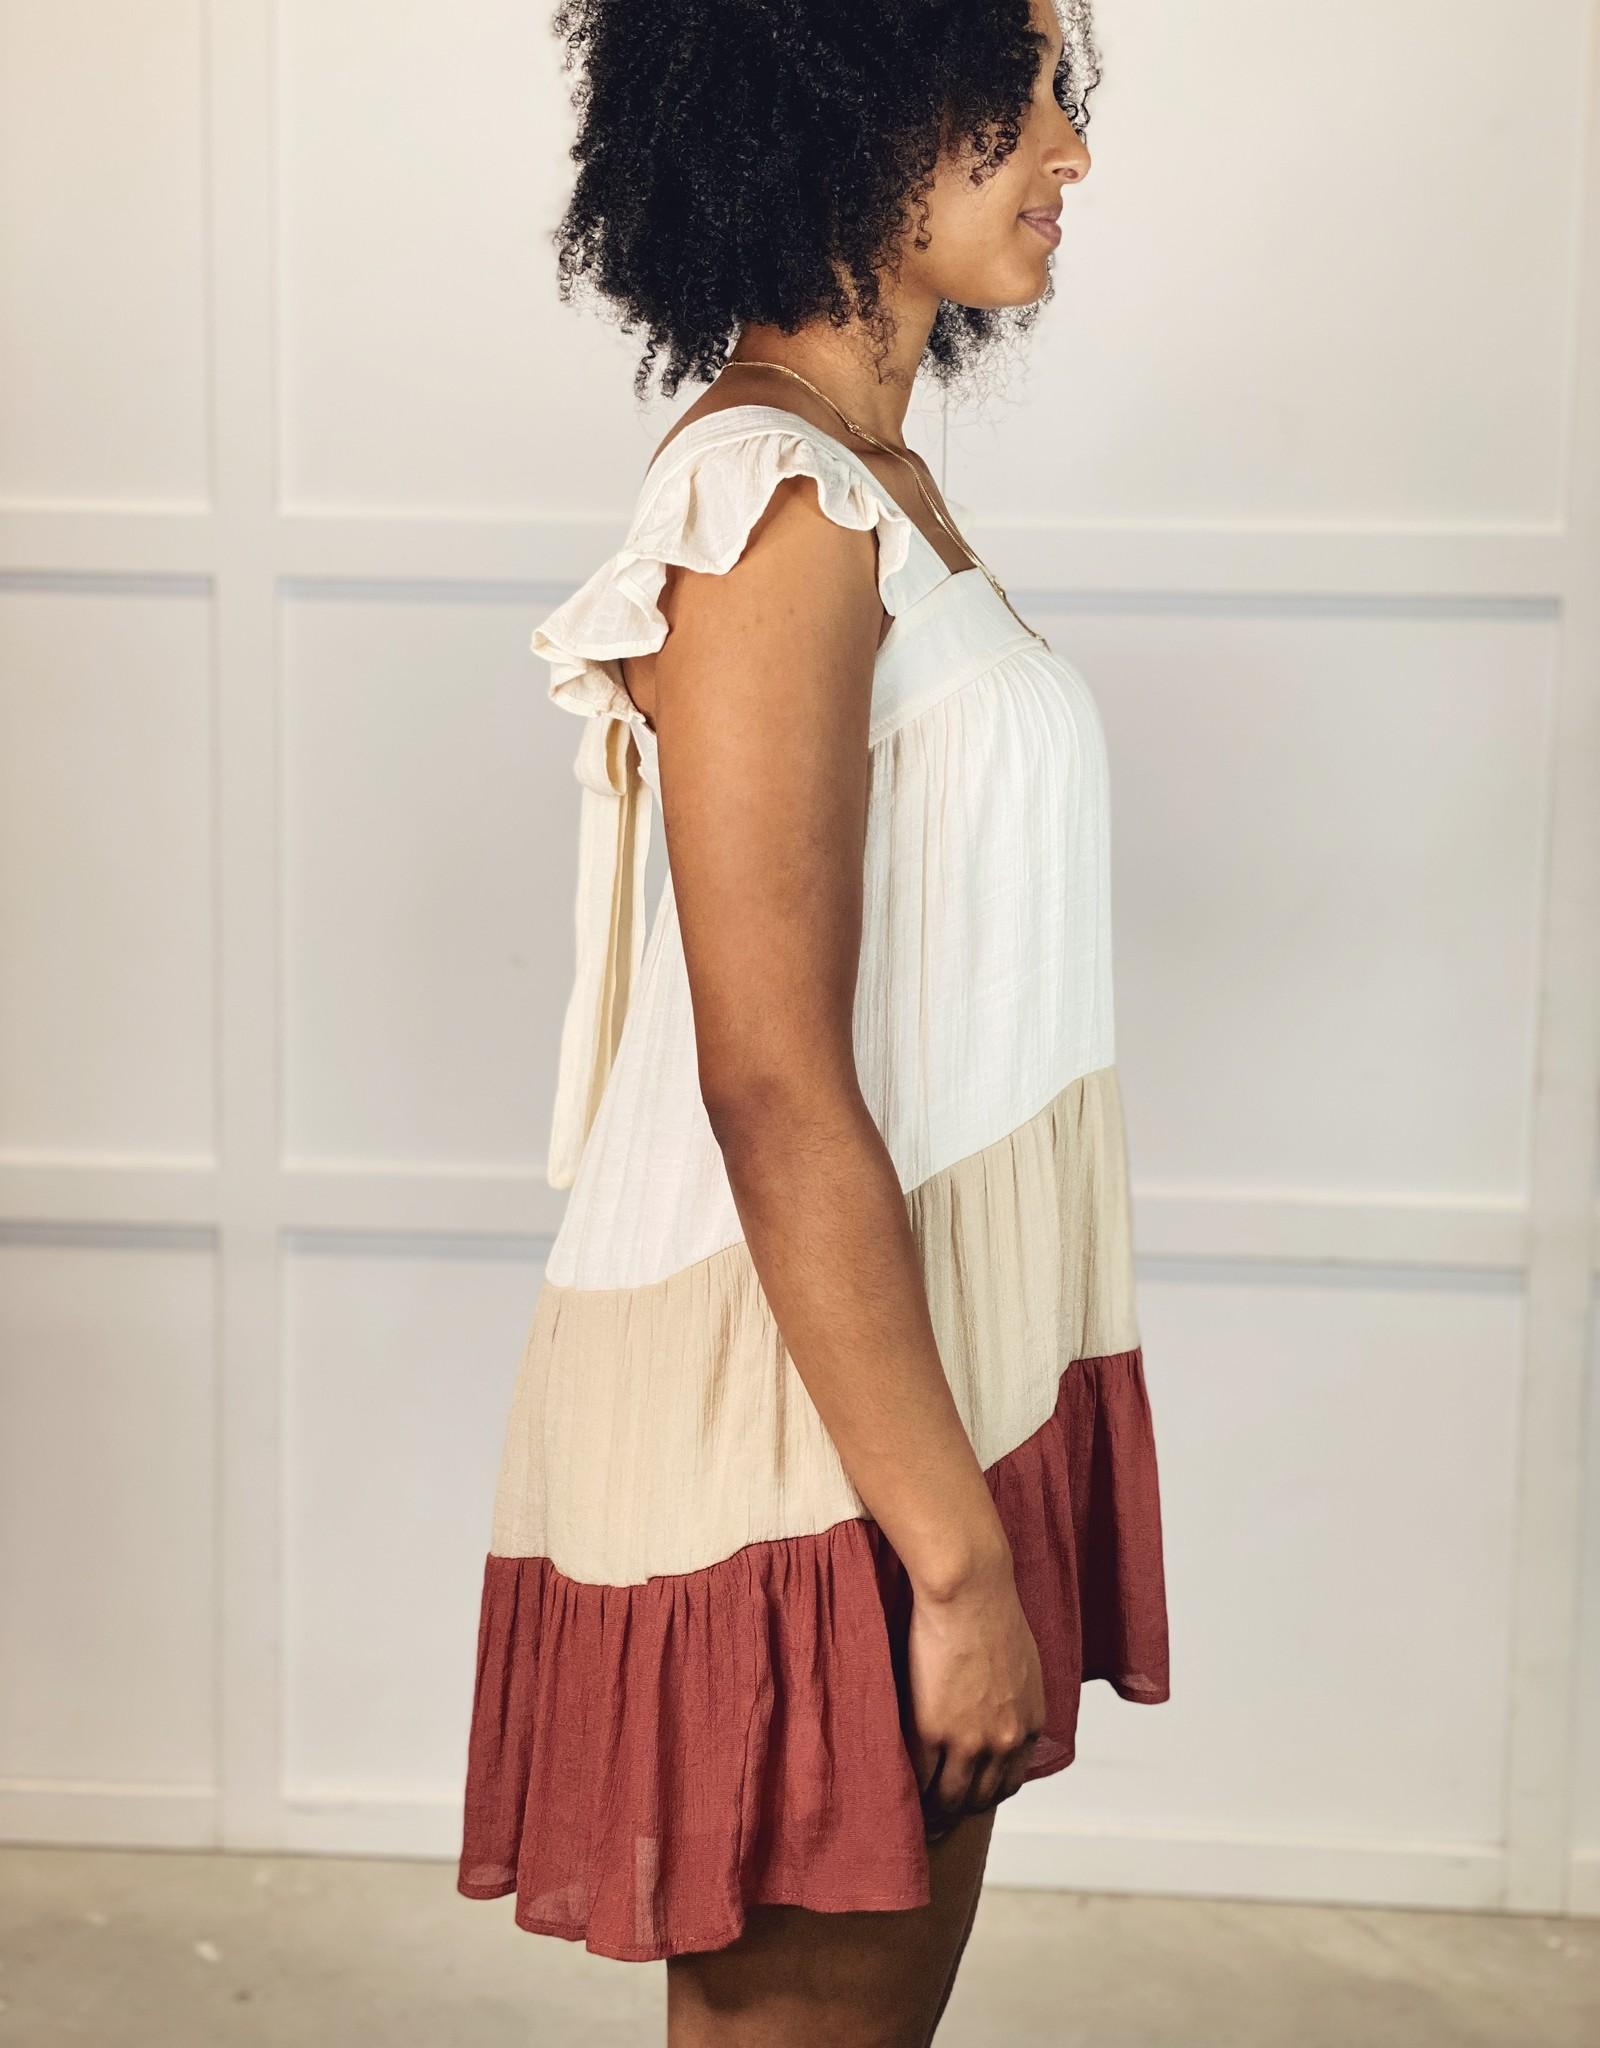 HUSH BRIDGET dress